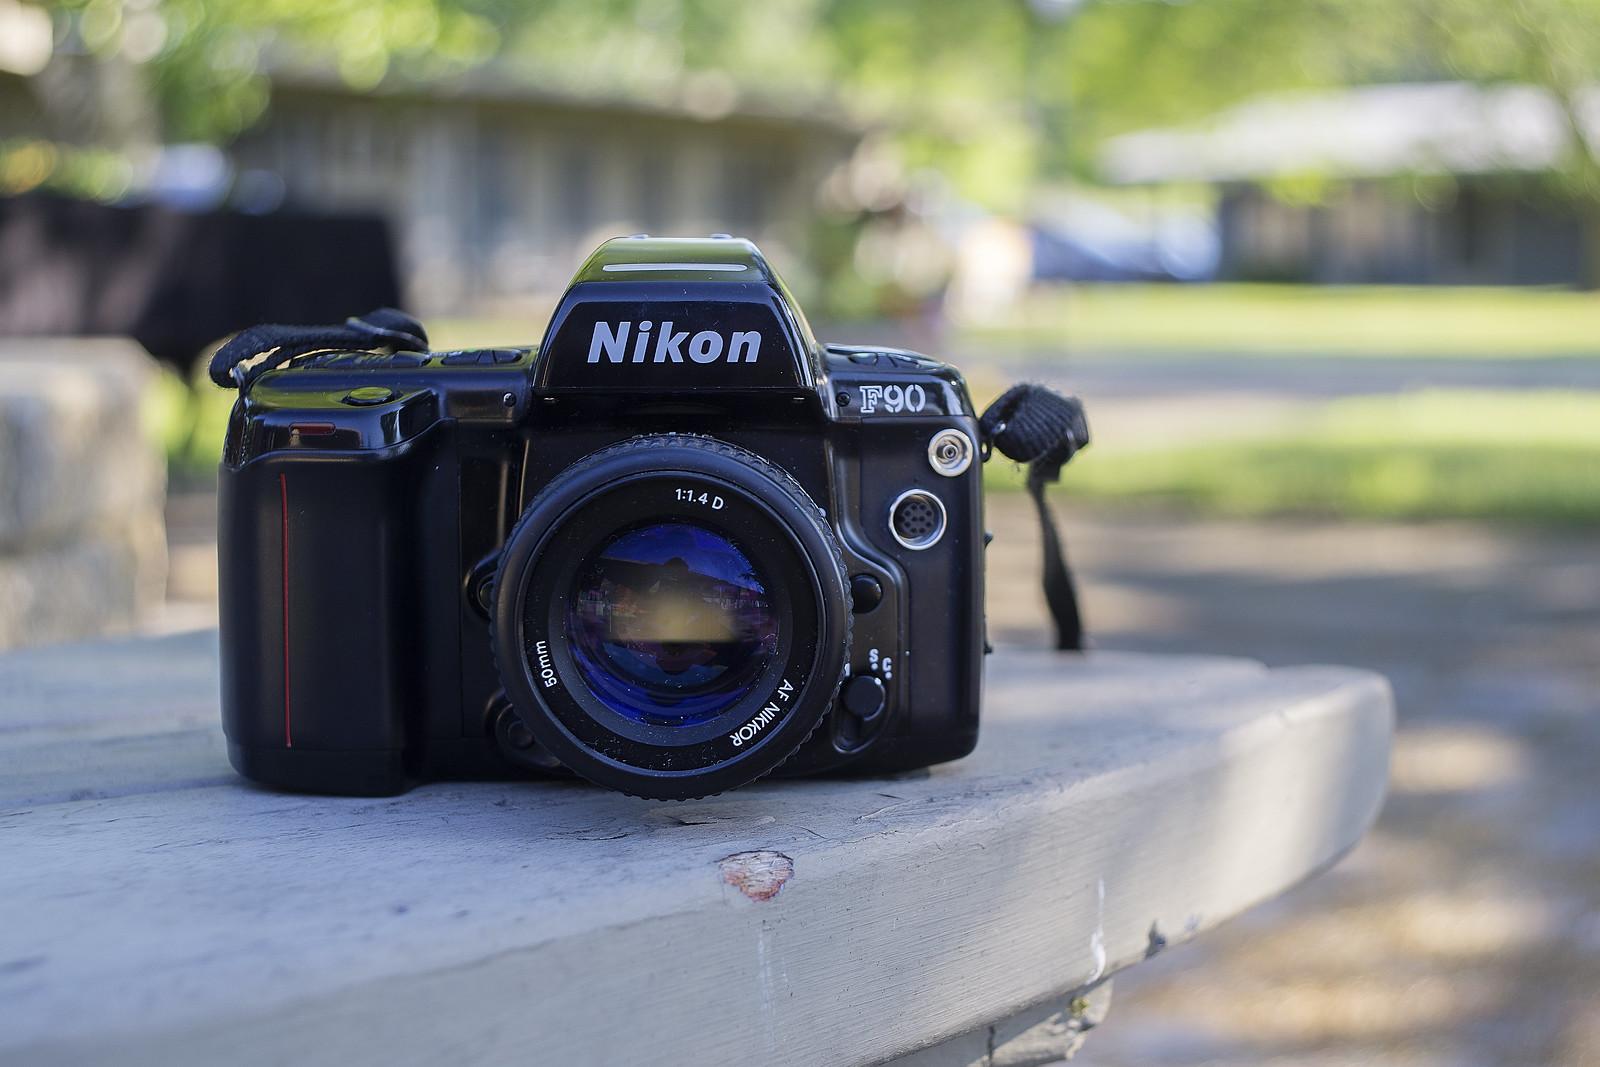 Camera Review Blog No. 41 - Nikon F90